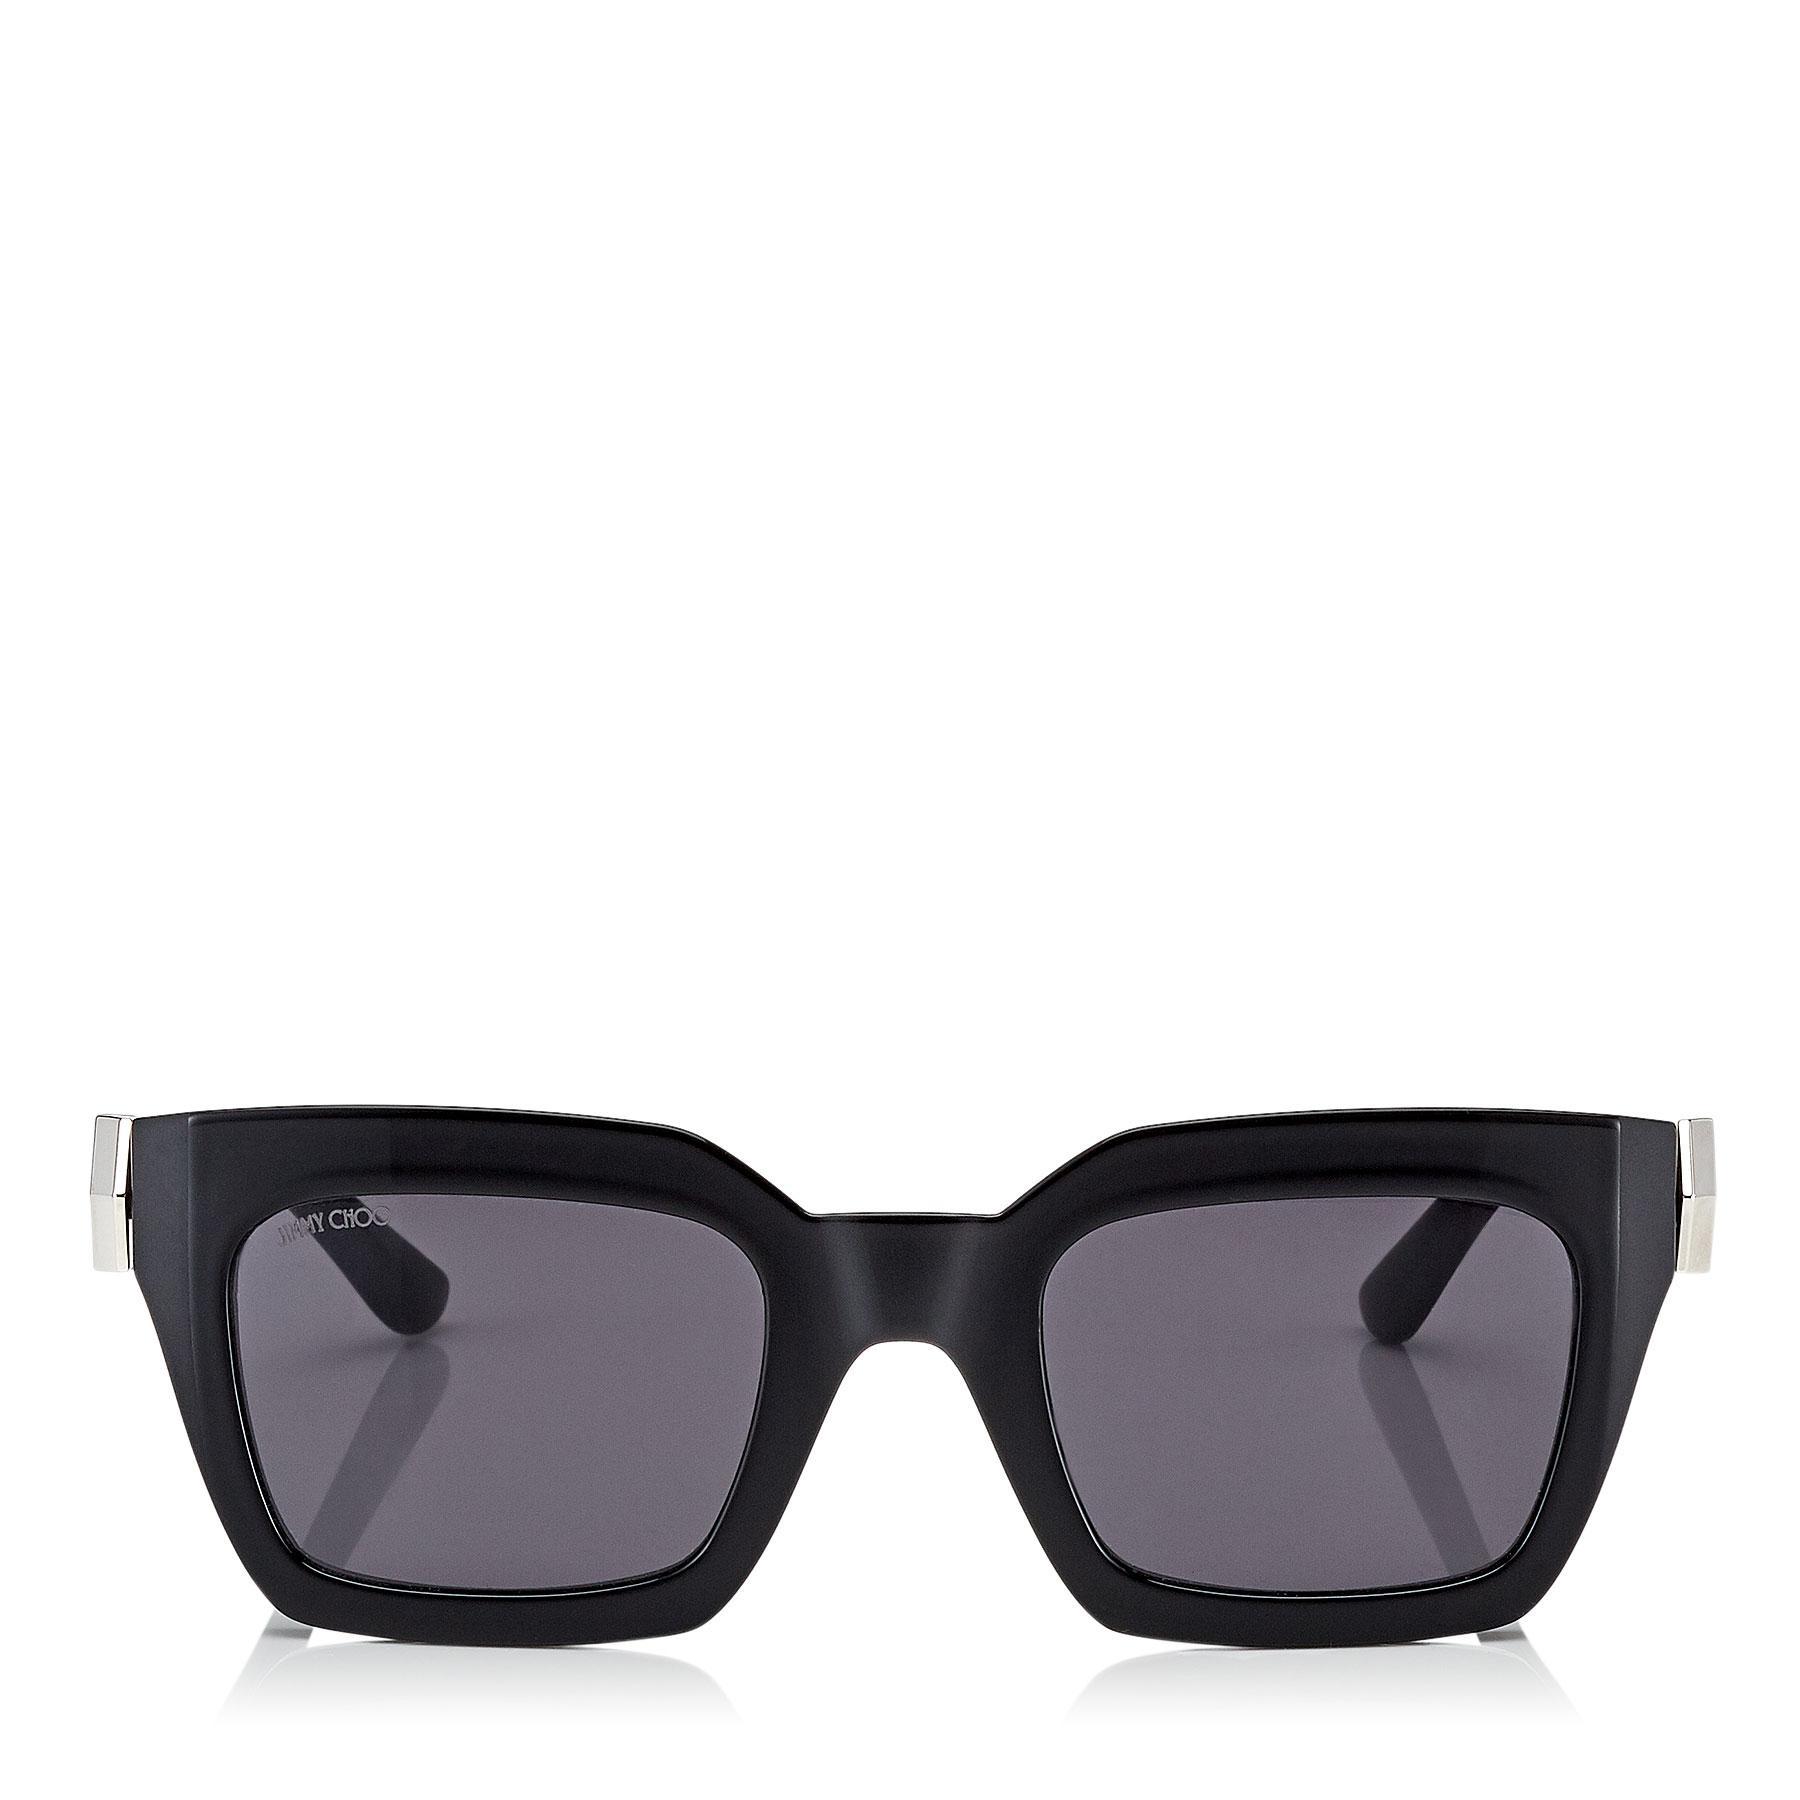 8a5c63f22b98 Jimmy Choo Maika Grey Cat Eye Sunglasses With Black Frame in Gray - Lyst